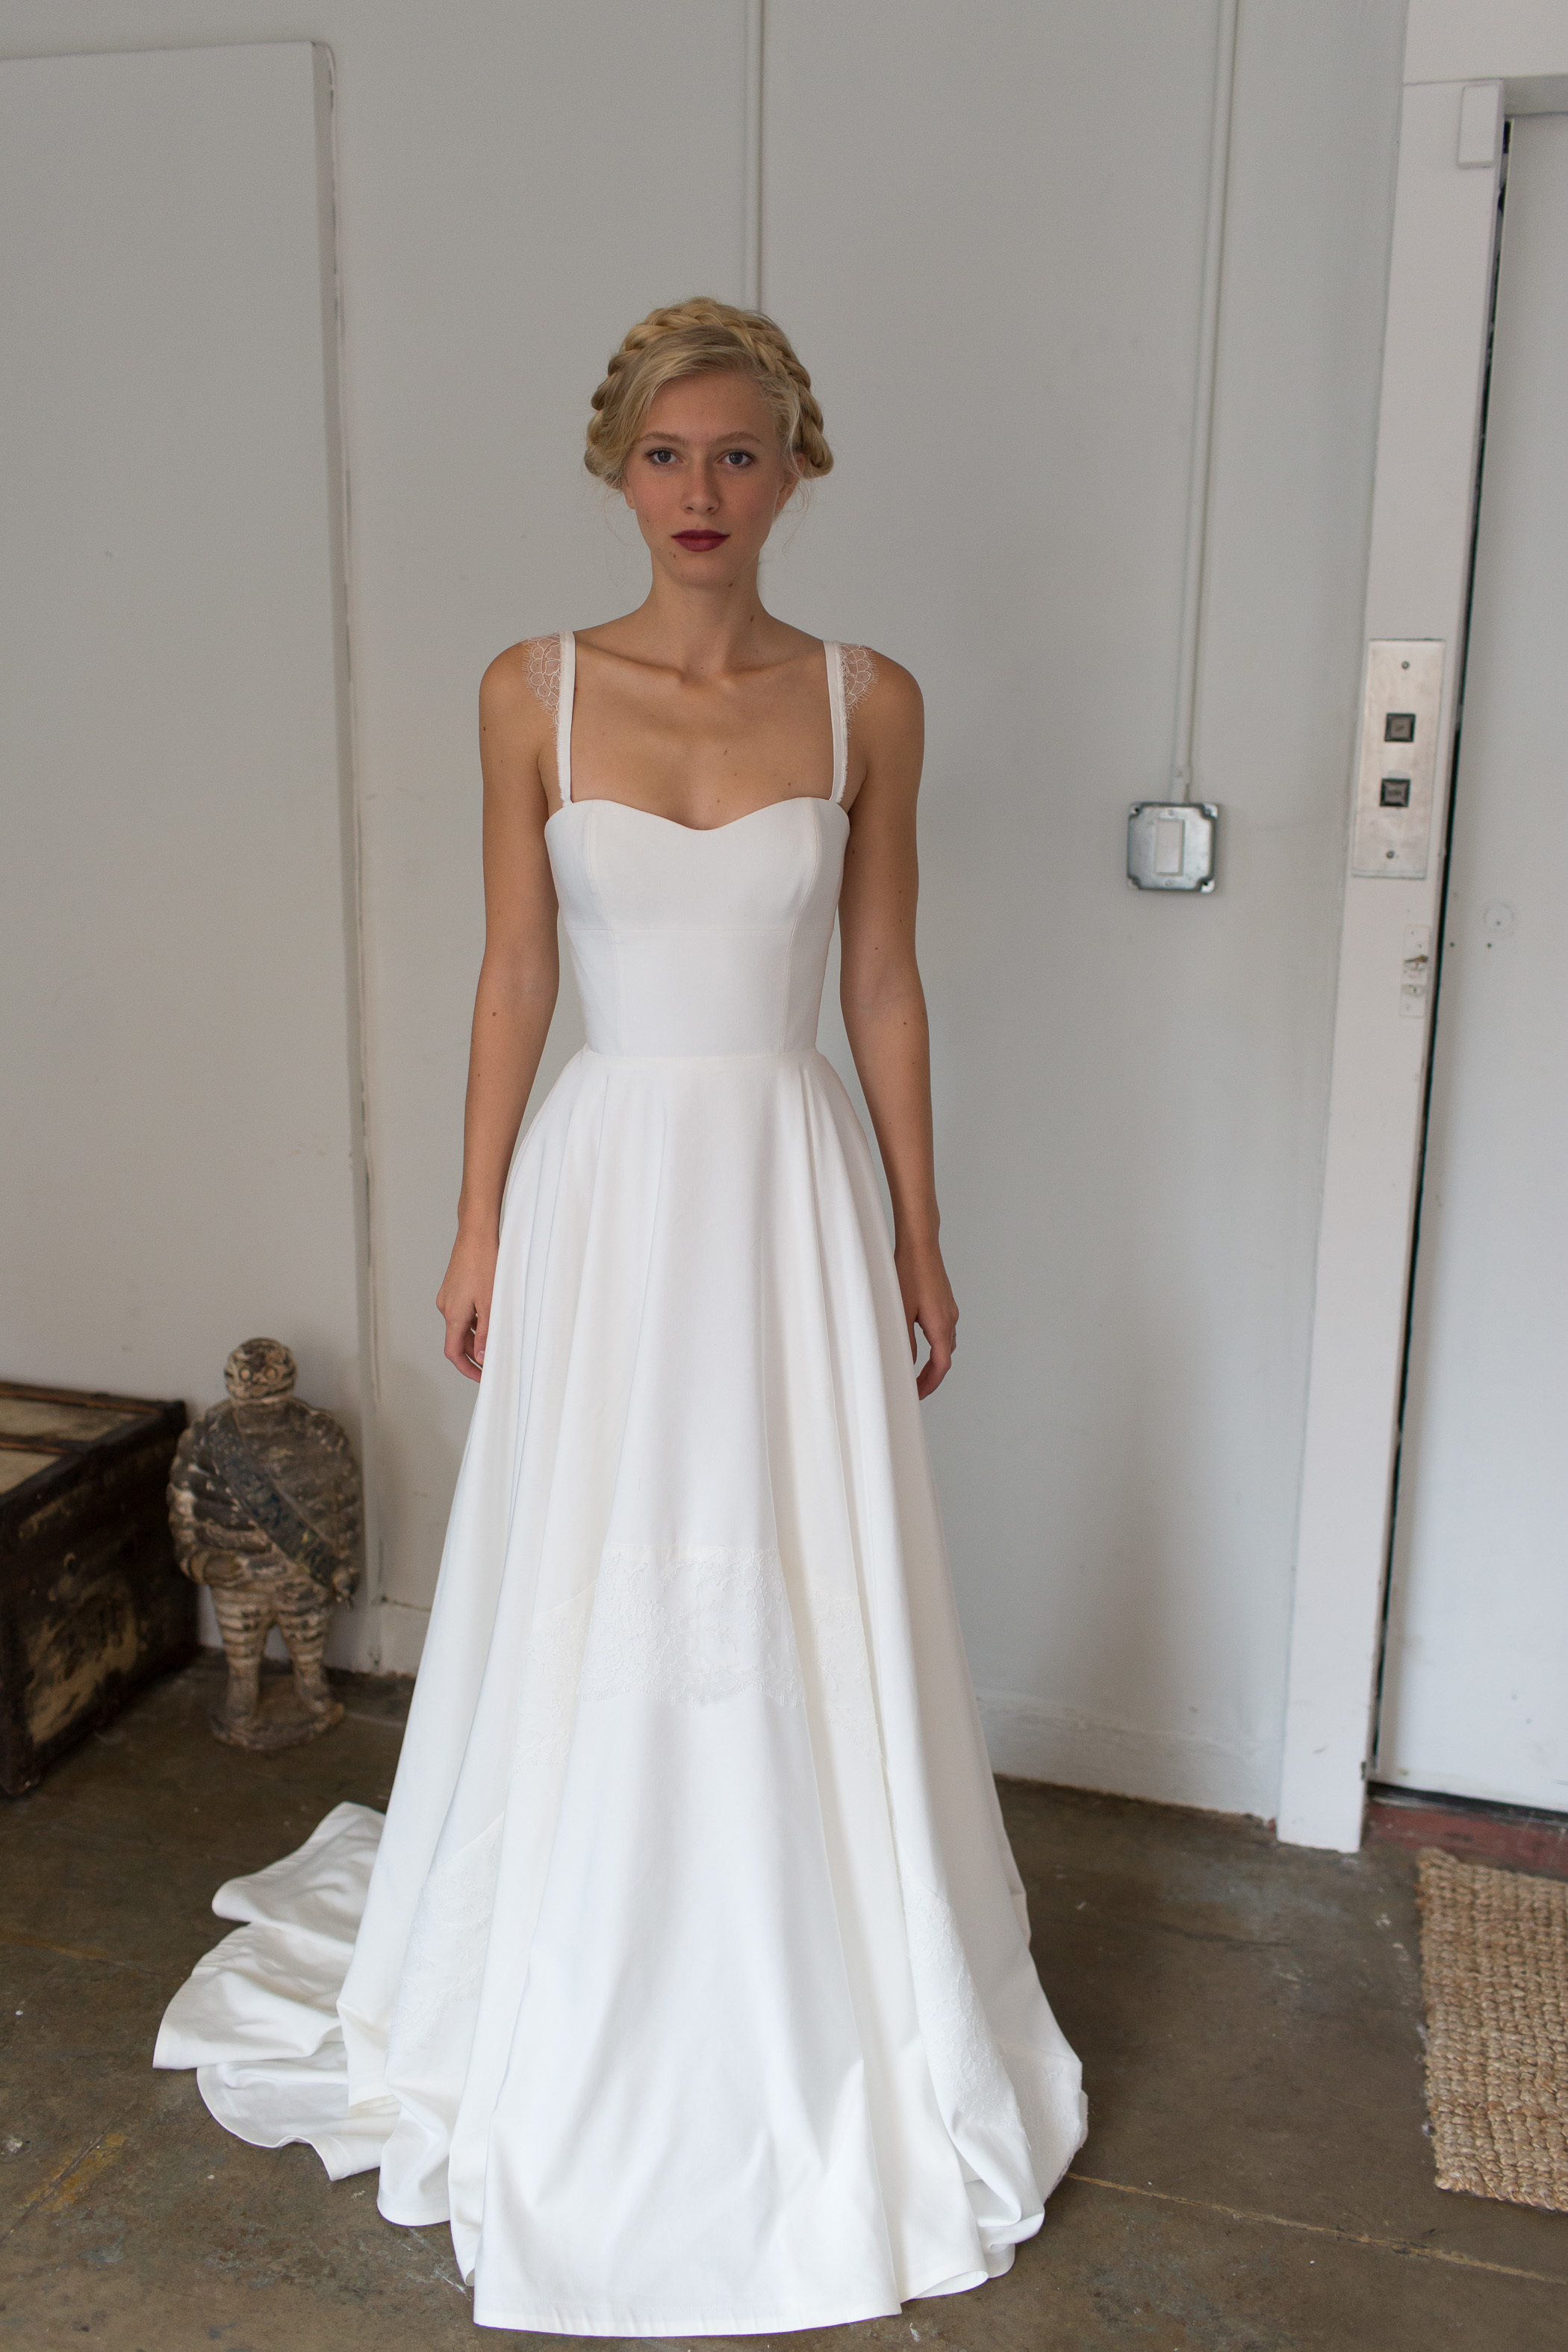 Piper wedding dress by Tara LaTour